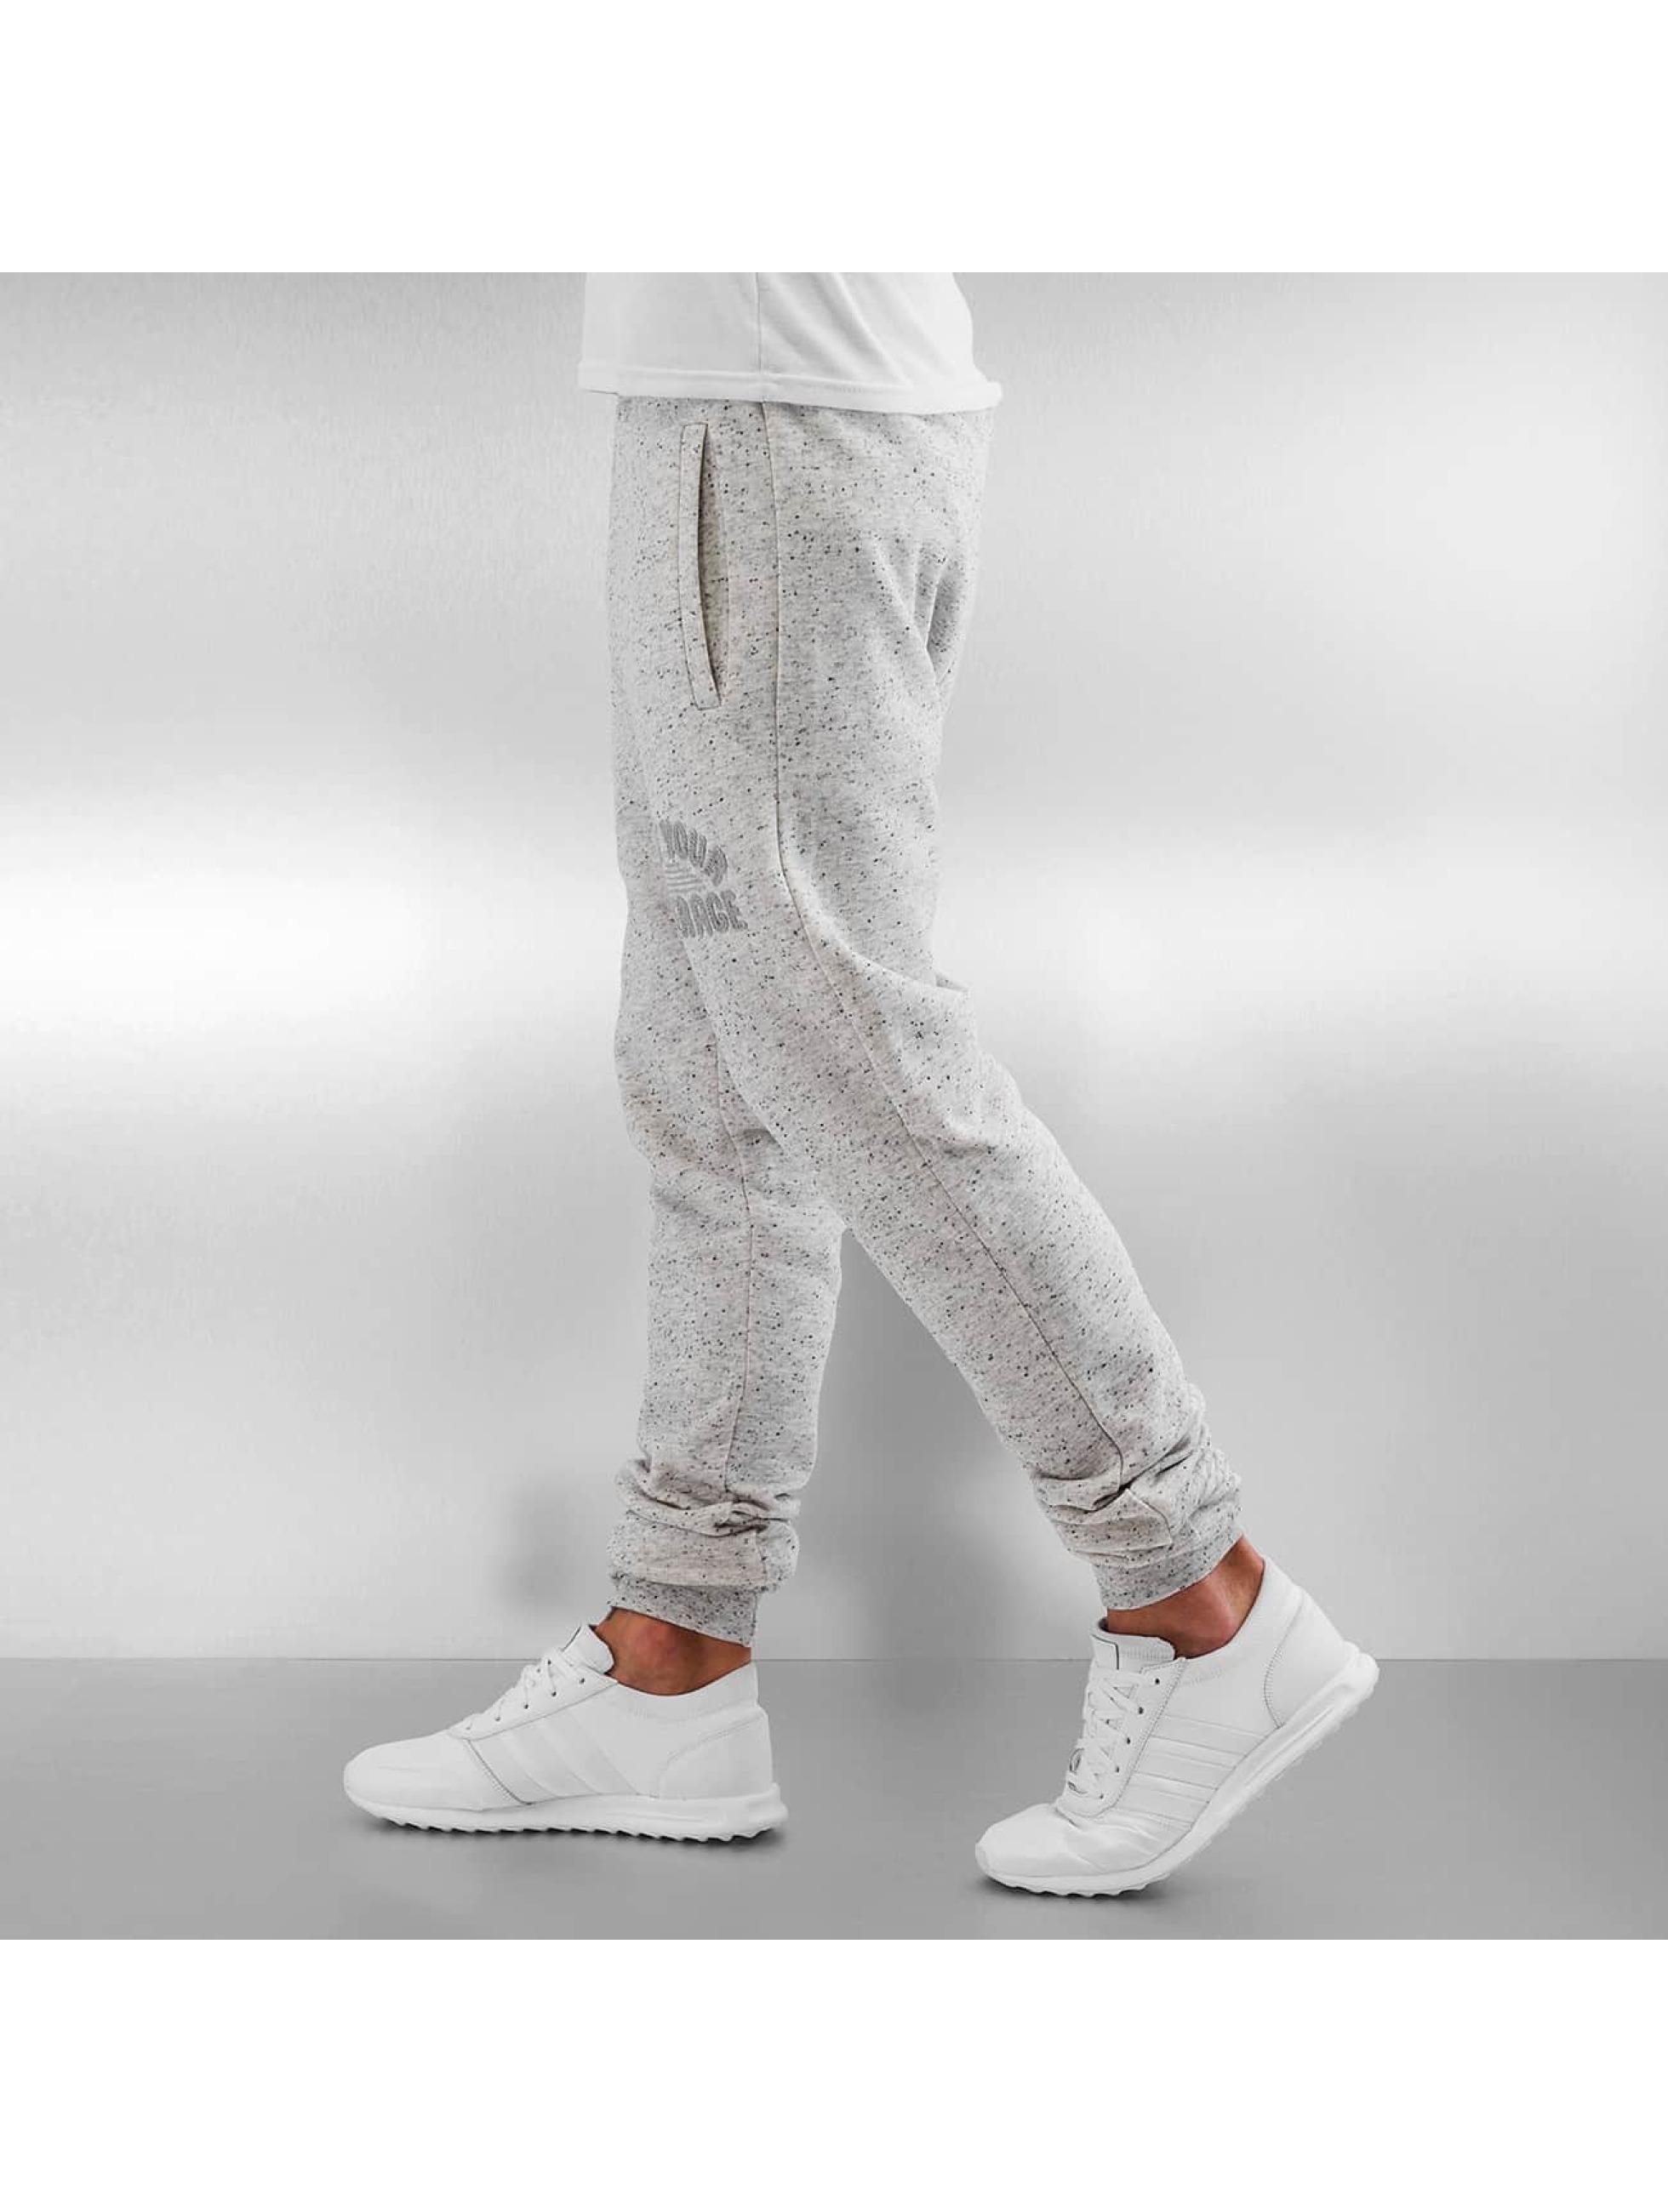 Pelle Pelle Спортивные брюки Not Your Average серый